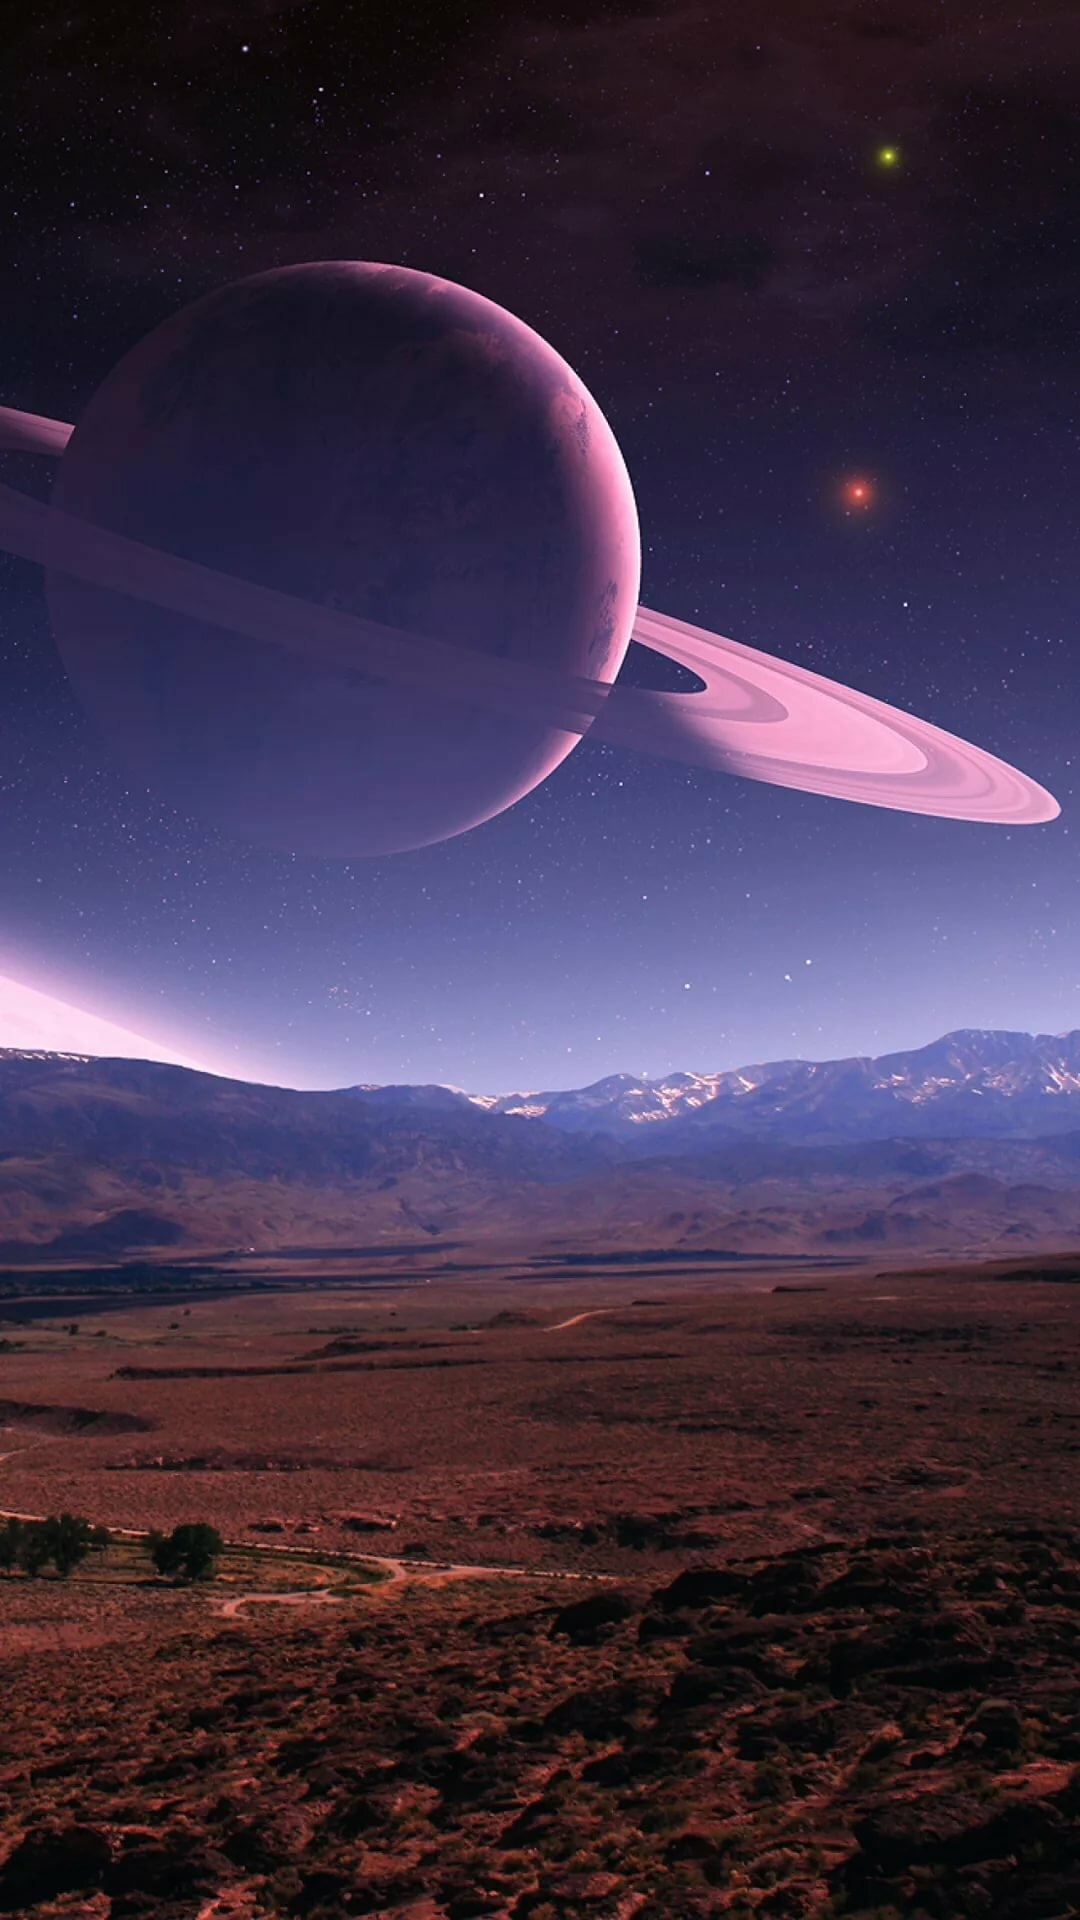 Saturn wallpaper for iphone